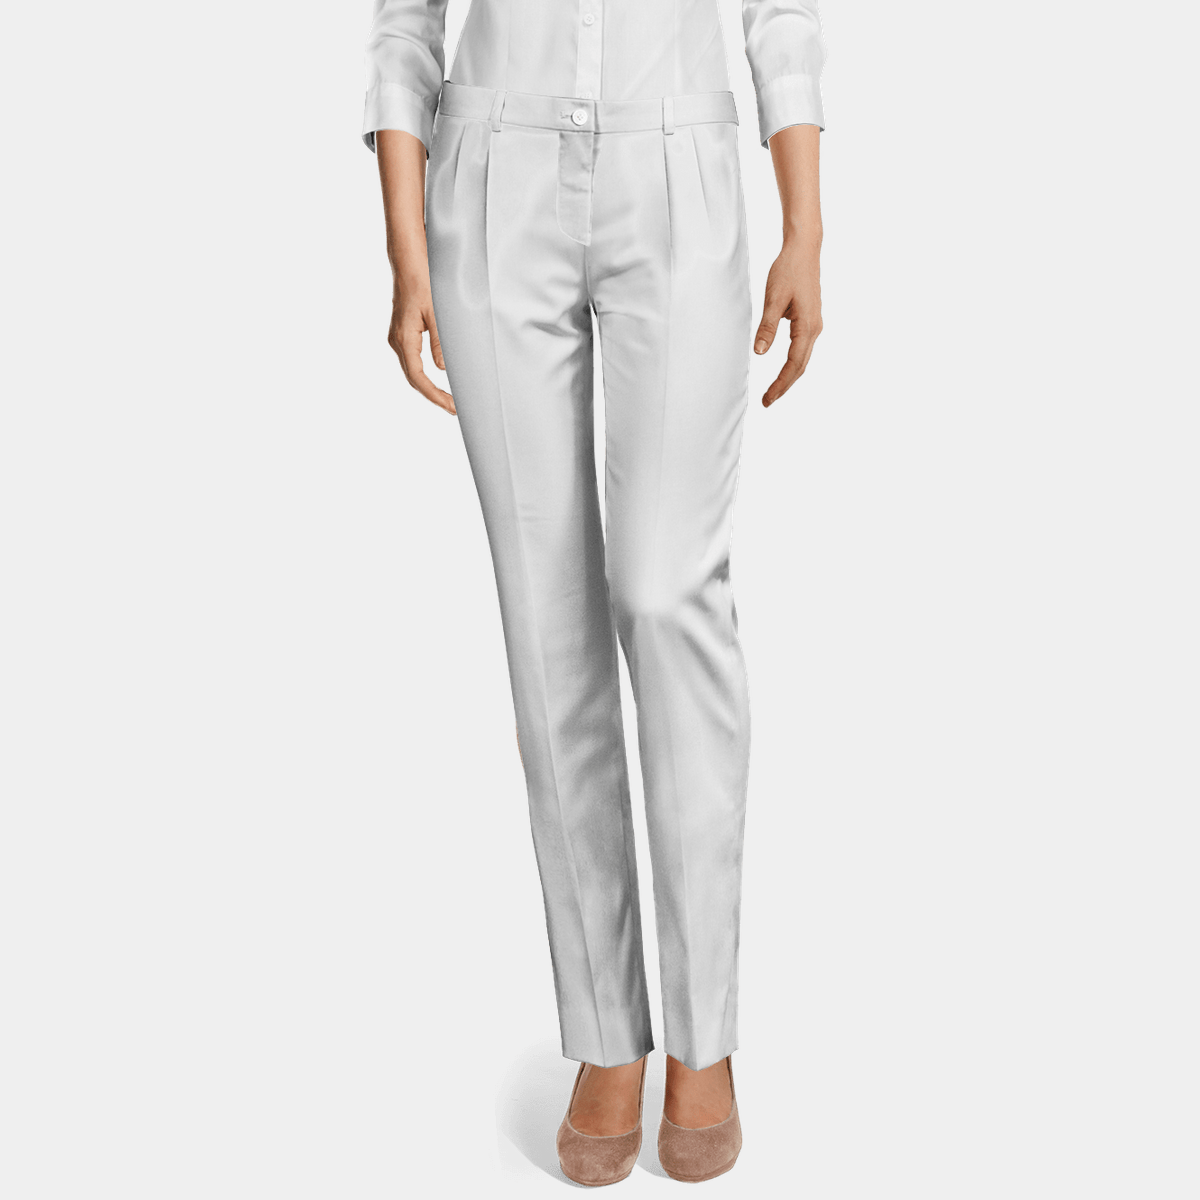 White Linen pleated Women Dress Pants